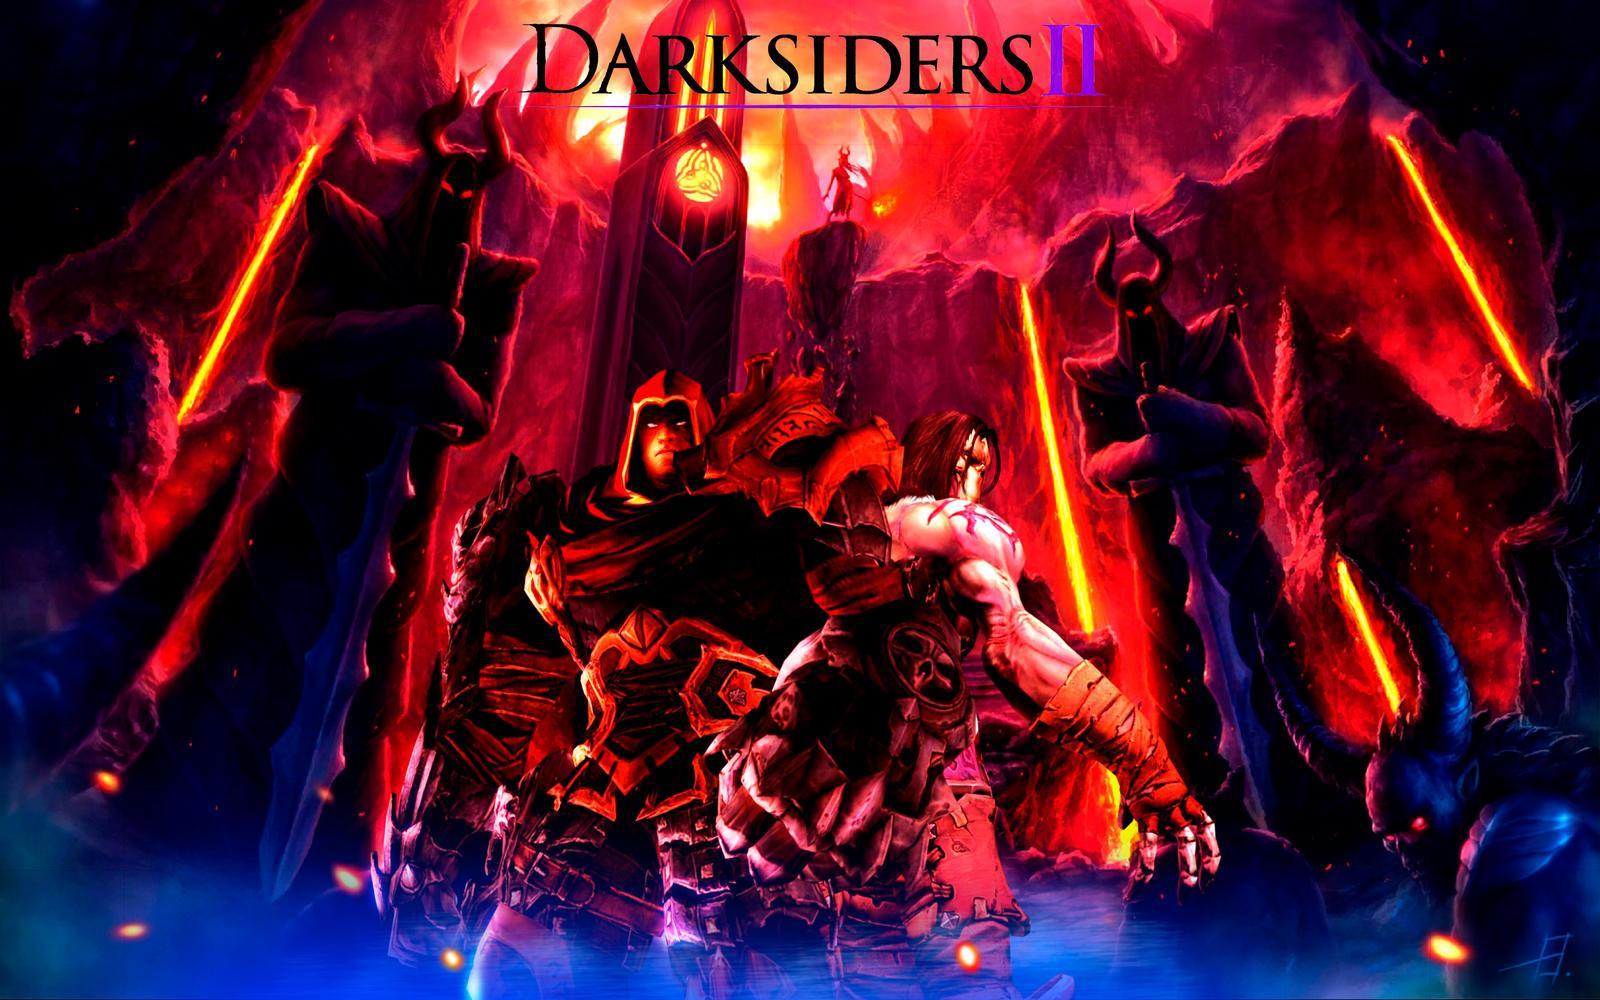 Darksiders War Wallpaper By: Darksiders 2 Wallpaper By DevilKazz On DeviantArt